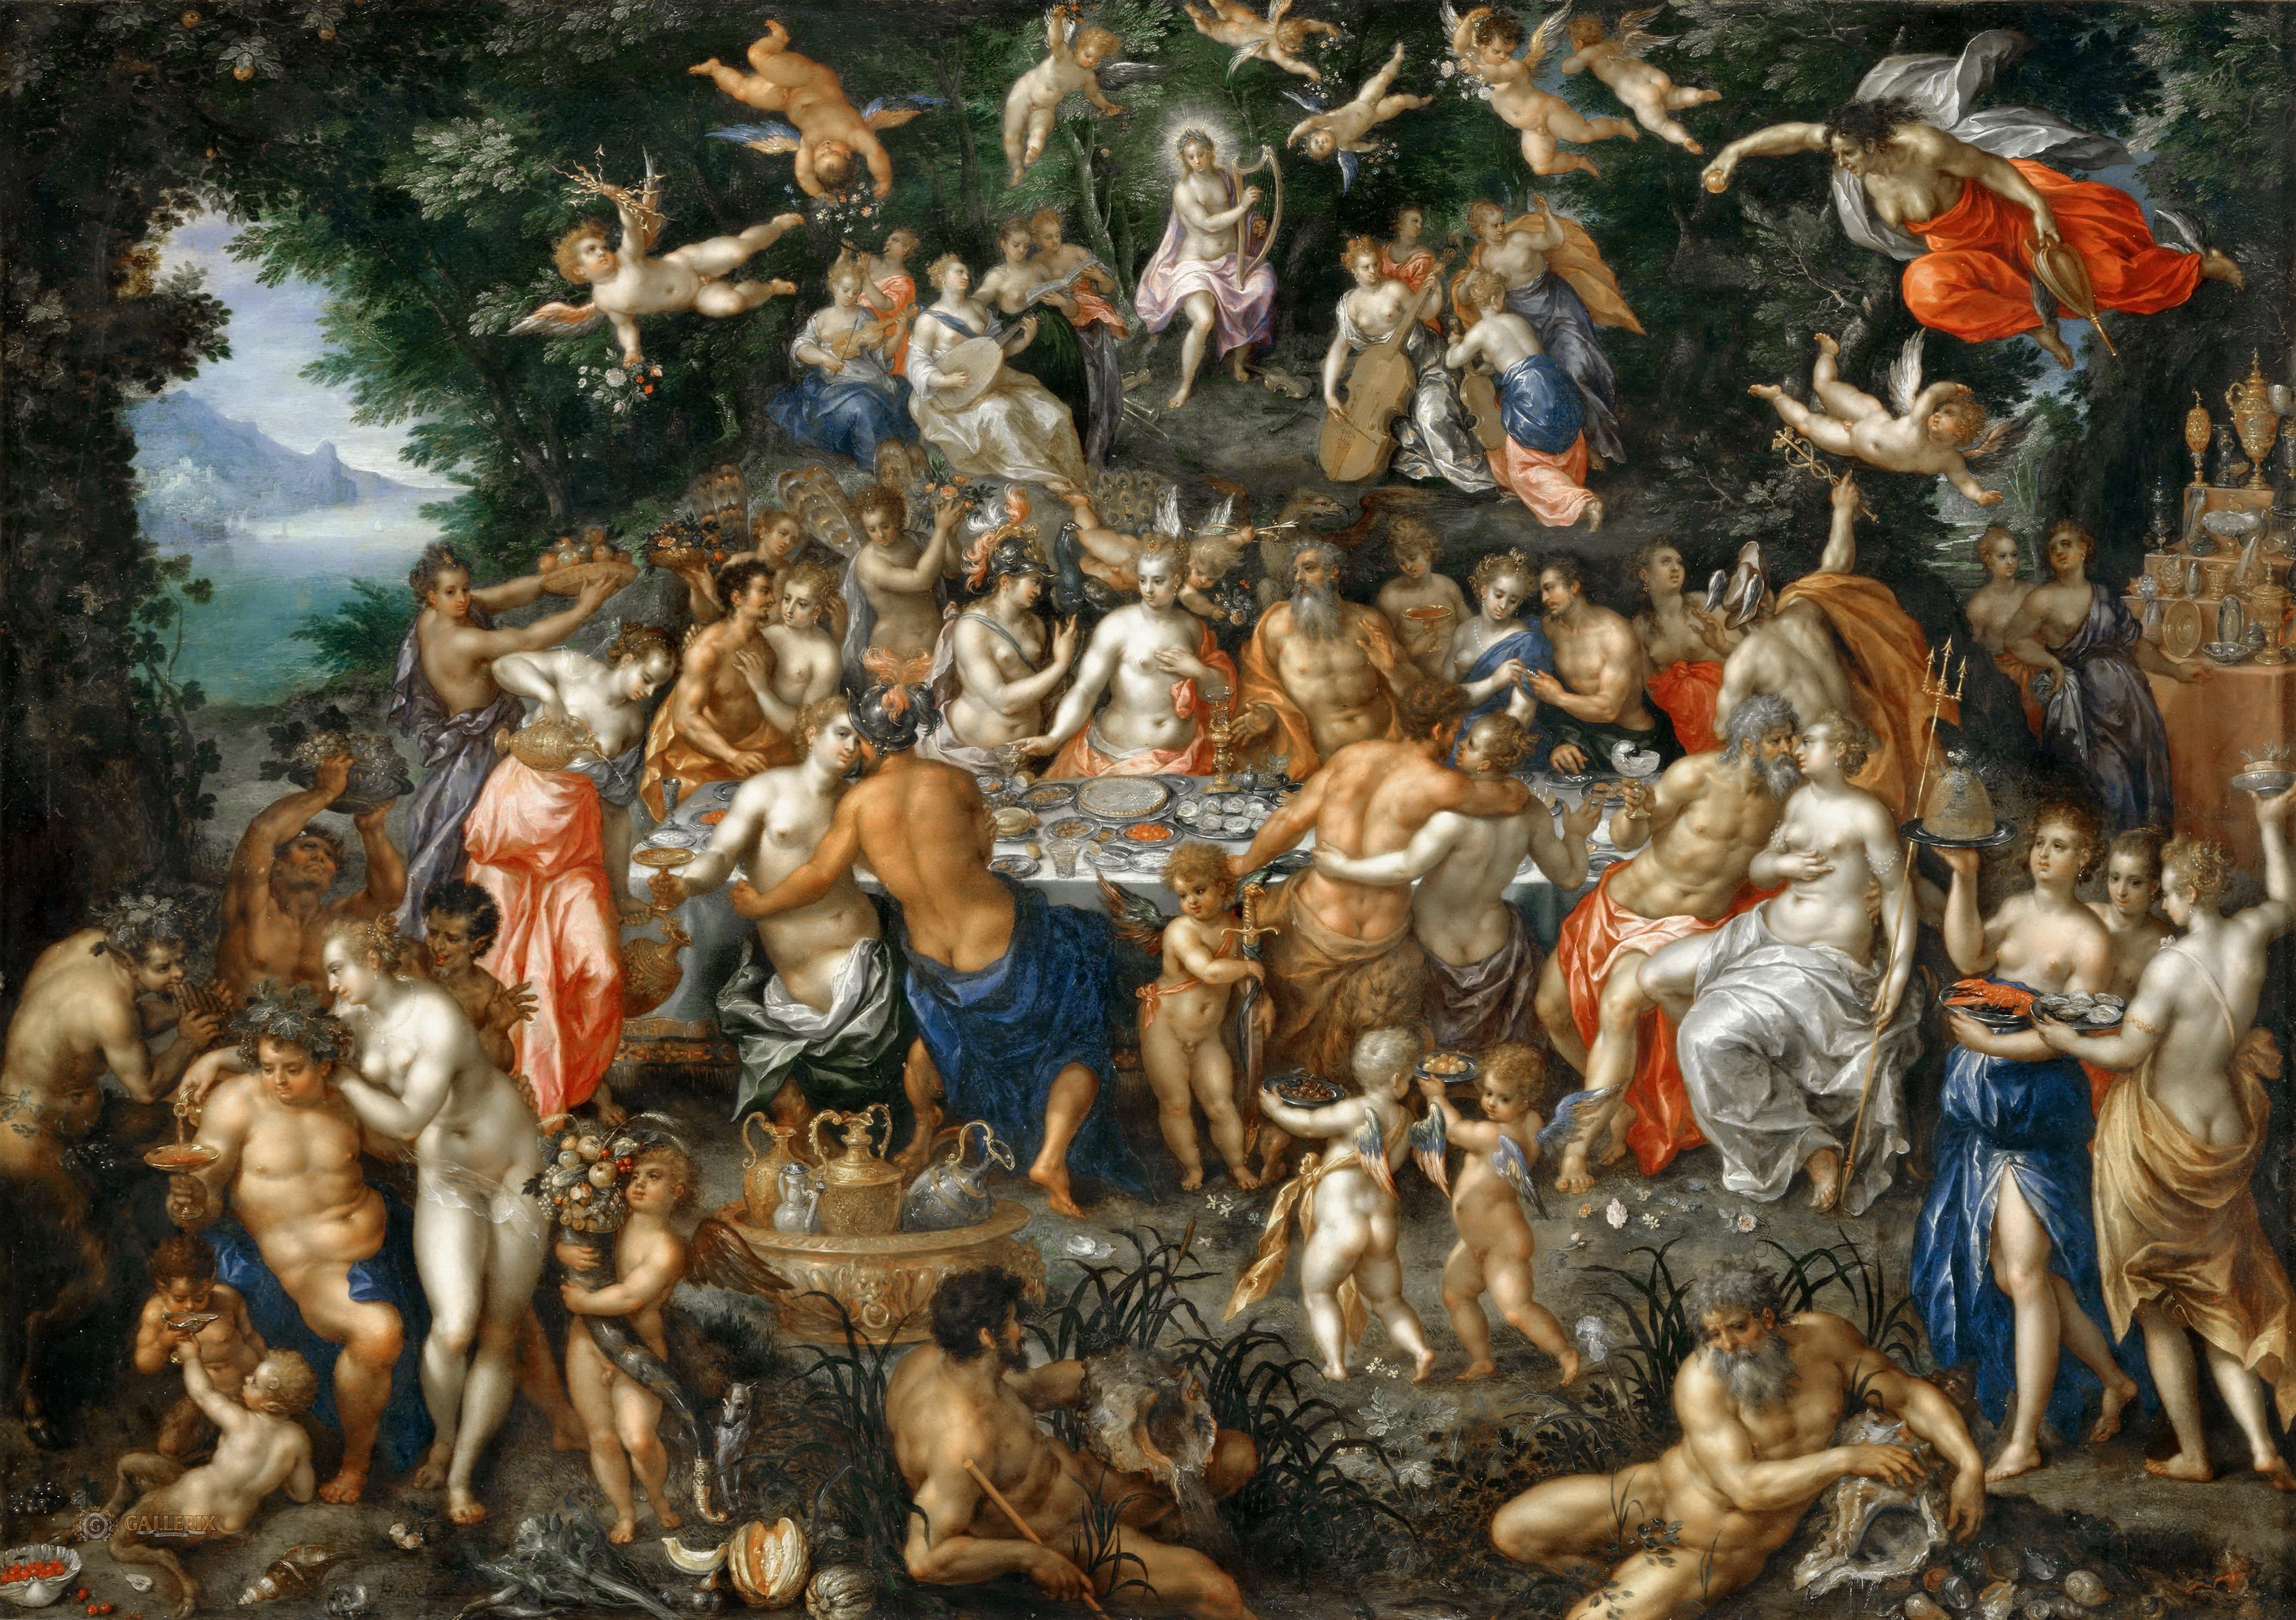 File:Hendrik de Clerck - The Nuptials of Thetis and Peleus